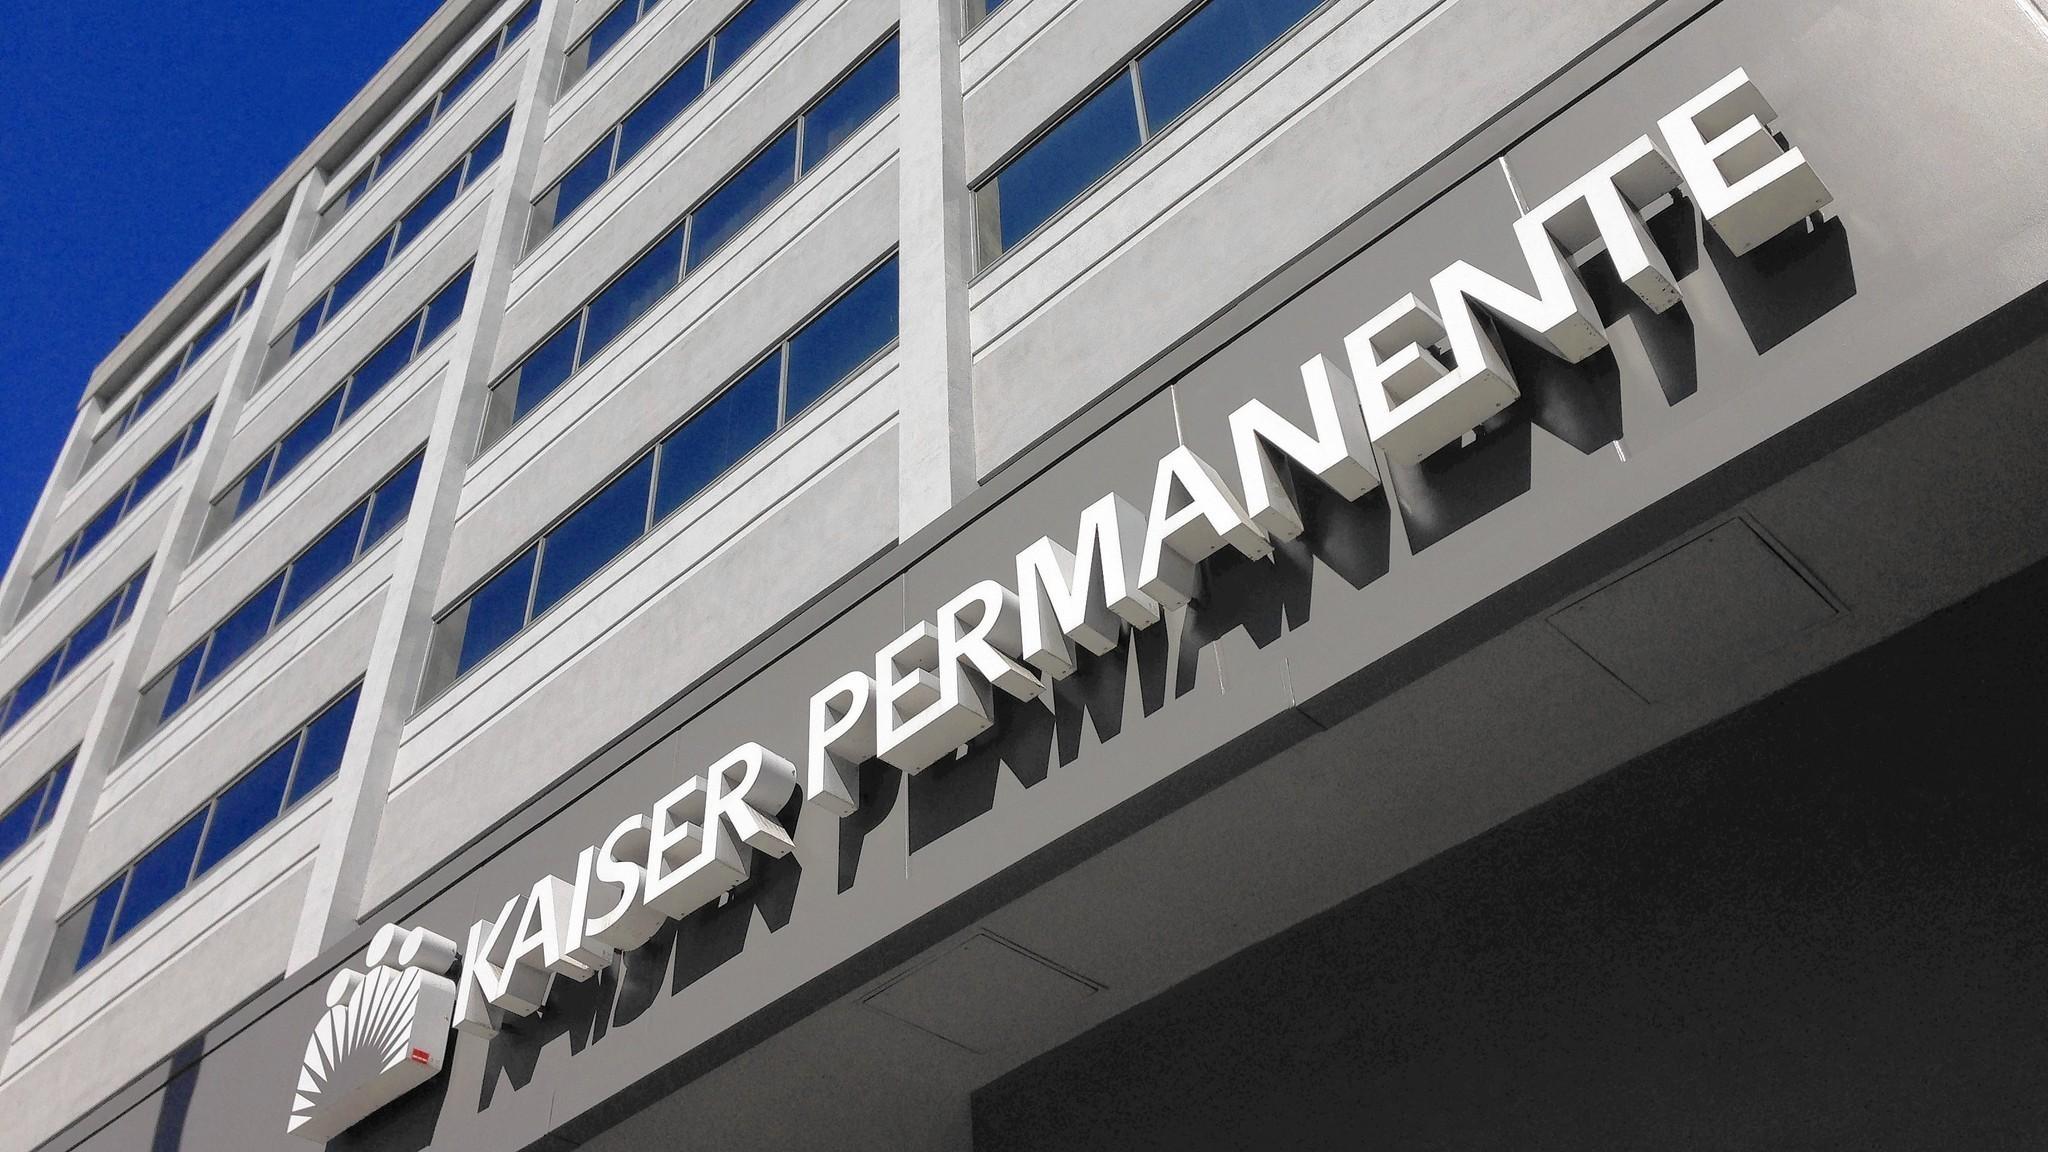 Kaiser criticized over mental healthcare staffing